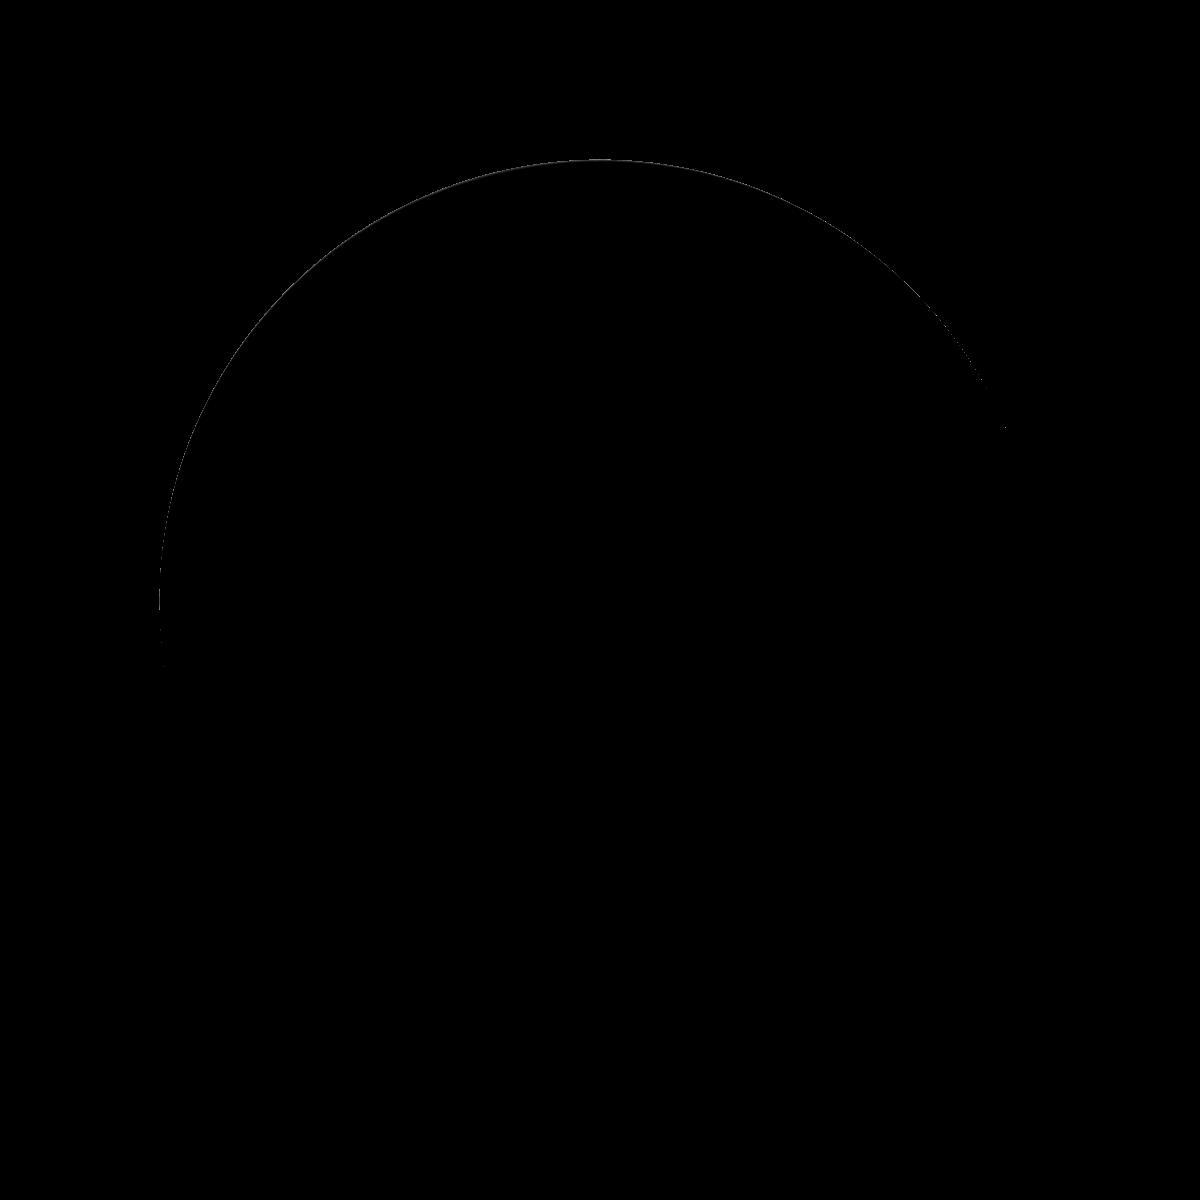 Lune du 24 mars 2020